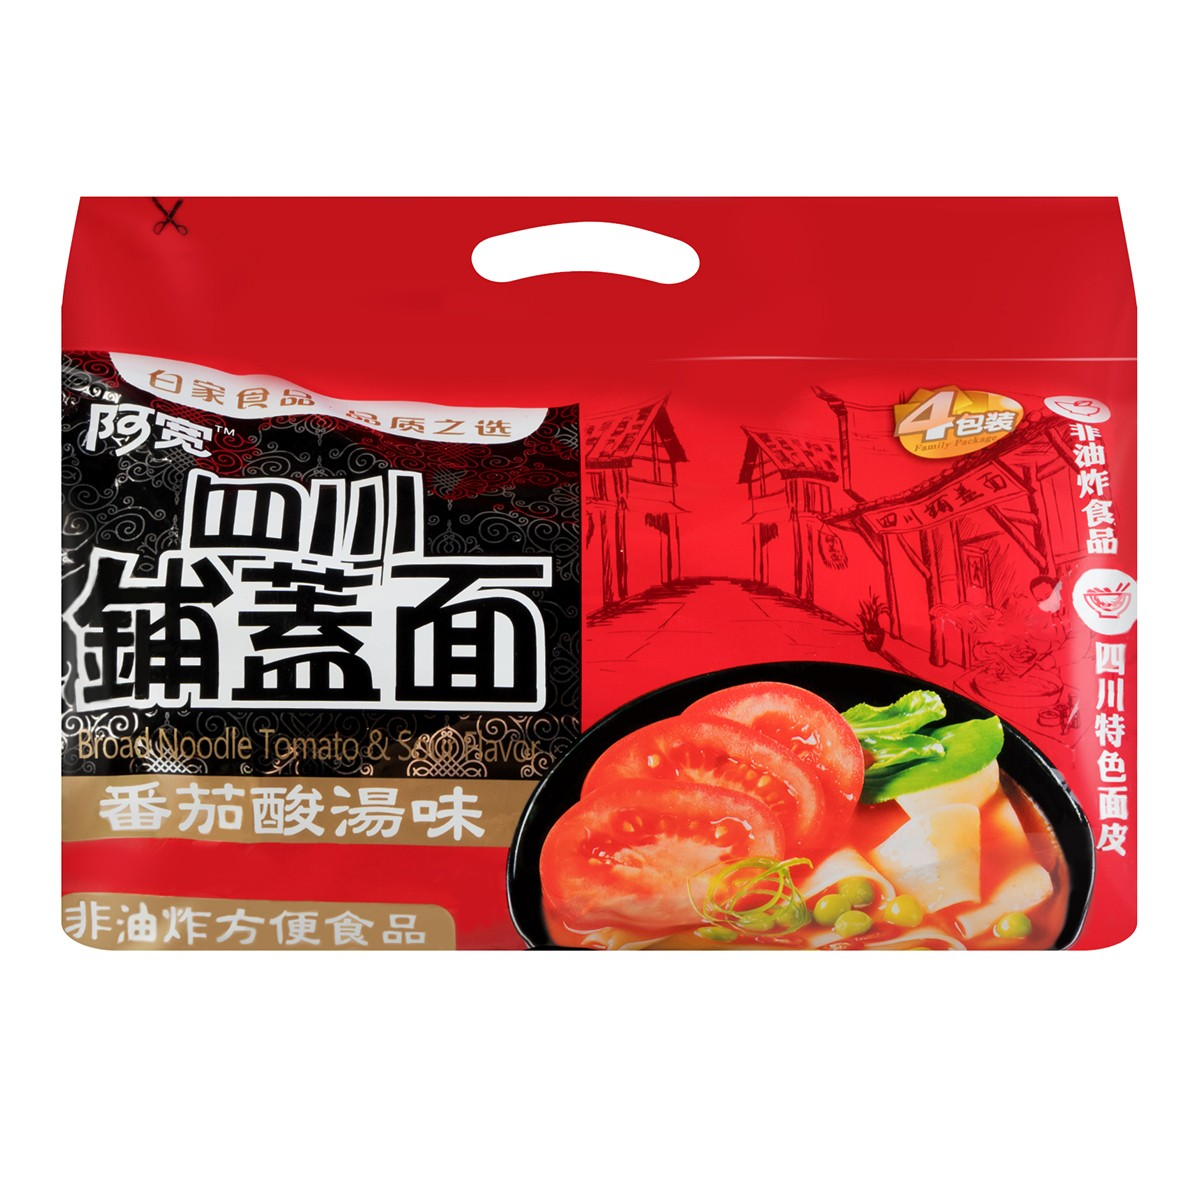 BAIJIA Broad Noodle Tomato & Sour Flavor 480g